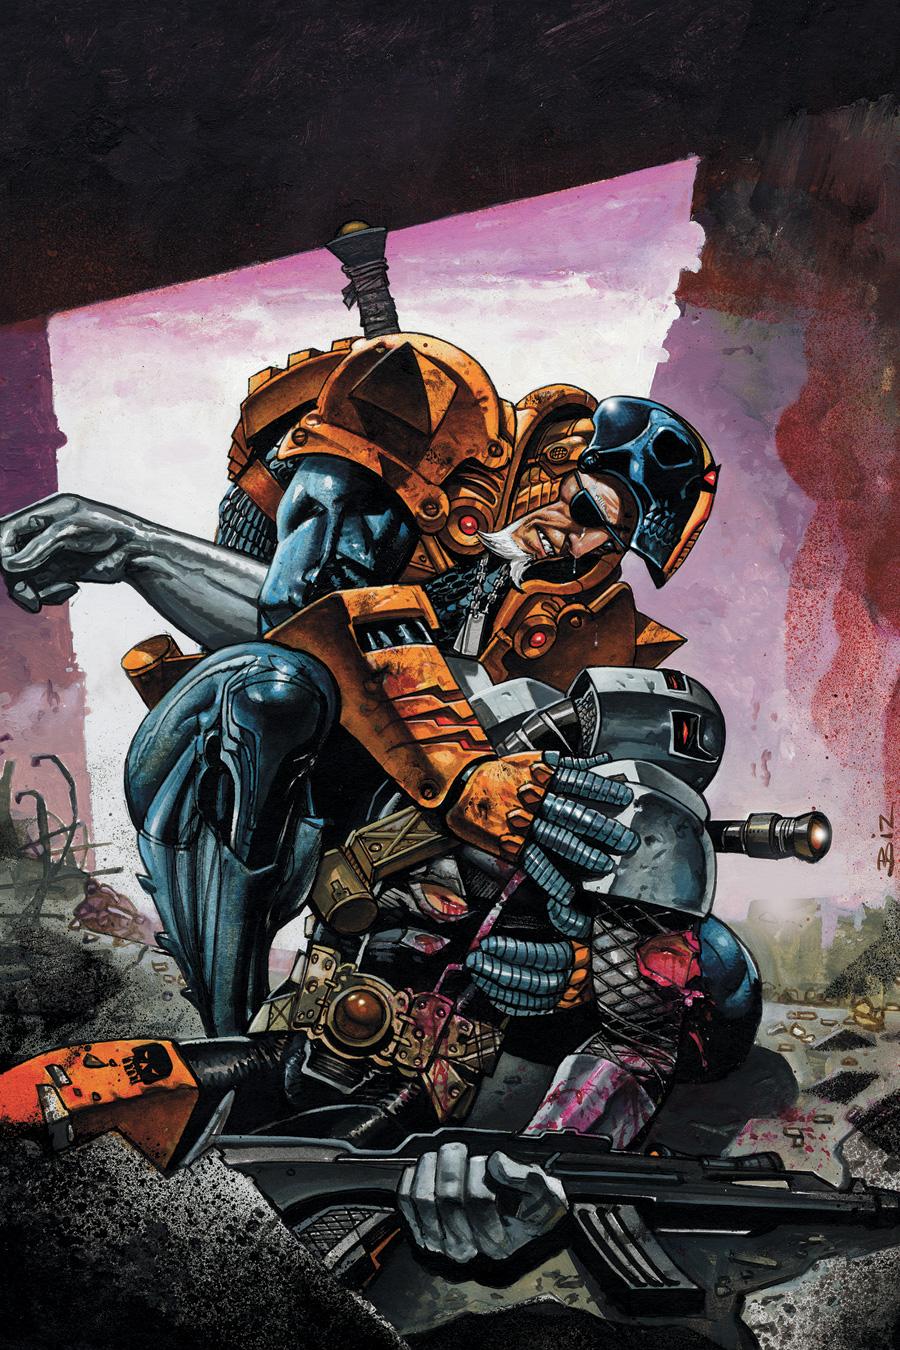 Deathstroke Vol 2 6 - DC Comics Database